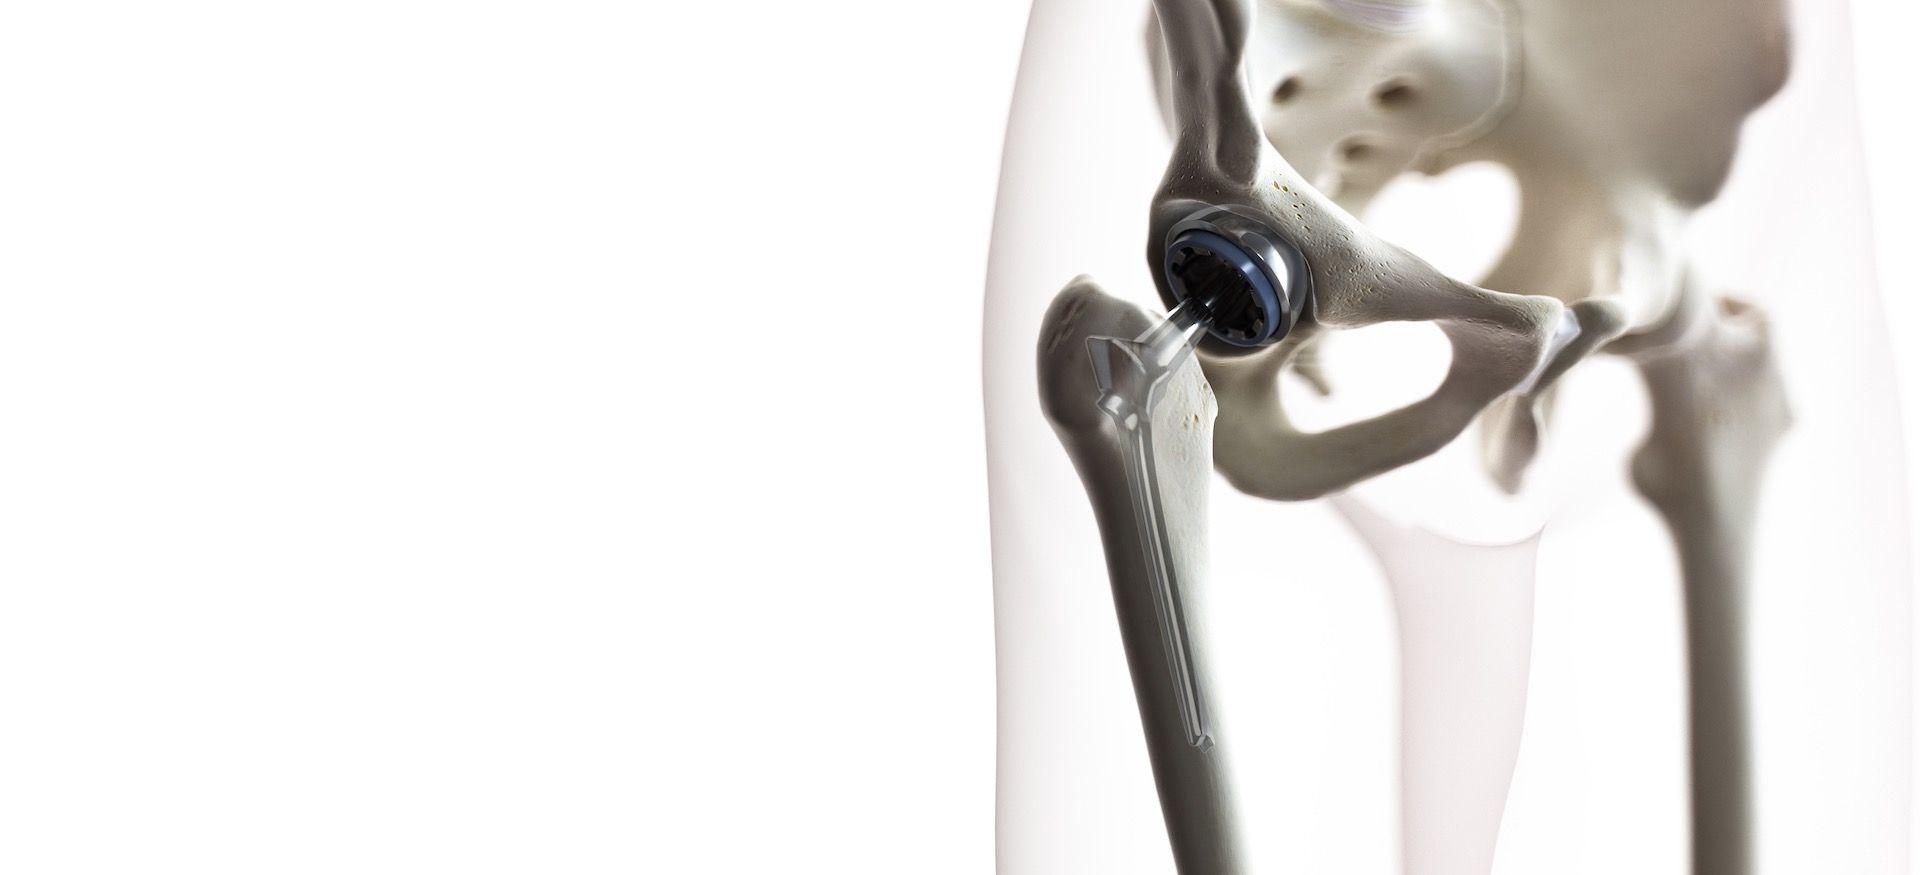 Cirujano-Ortopedista-en-Satelite-Naucalpan-Dr-Daniel-Machuca-Especialista-en-Ortopedia-v001-compressor